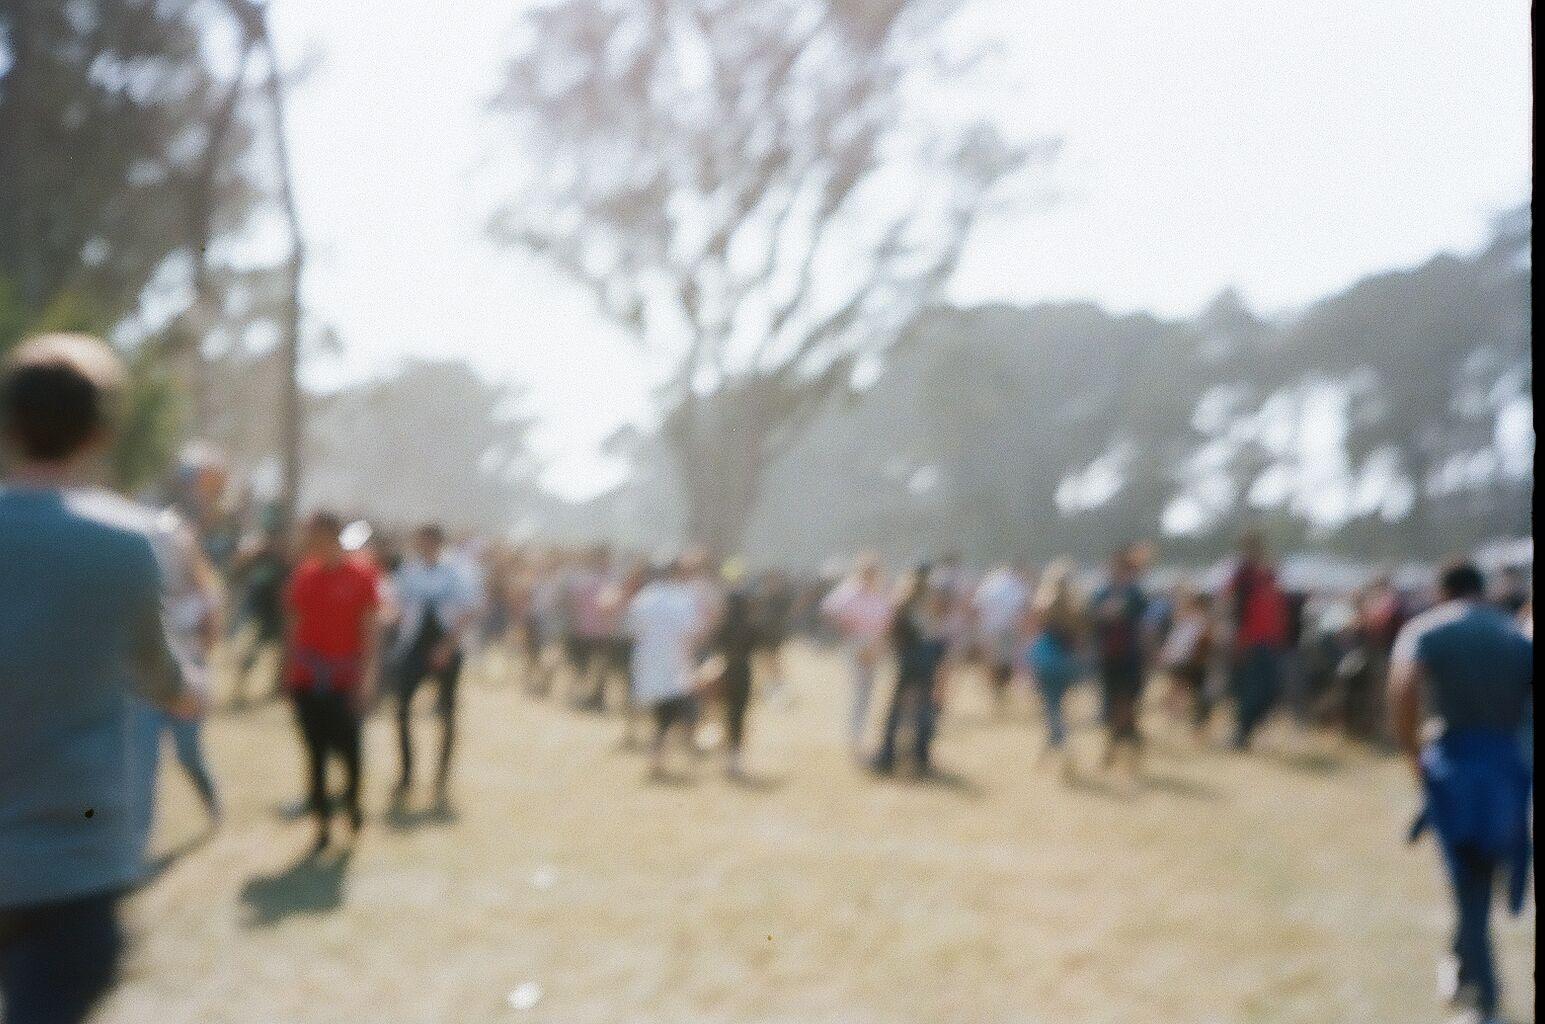 Outside Lands Festival in San Francisco, CA Kodak Portra 400 35mm Film Photography | SarahMichiko.com